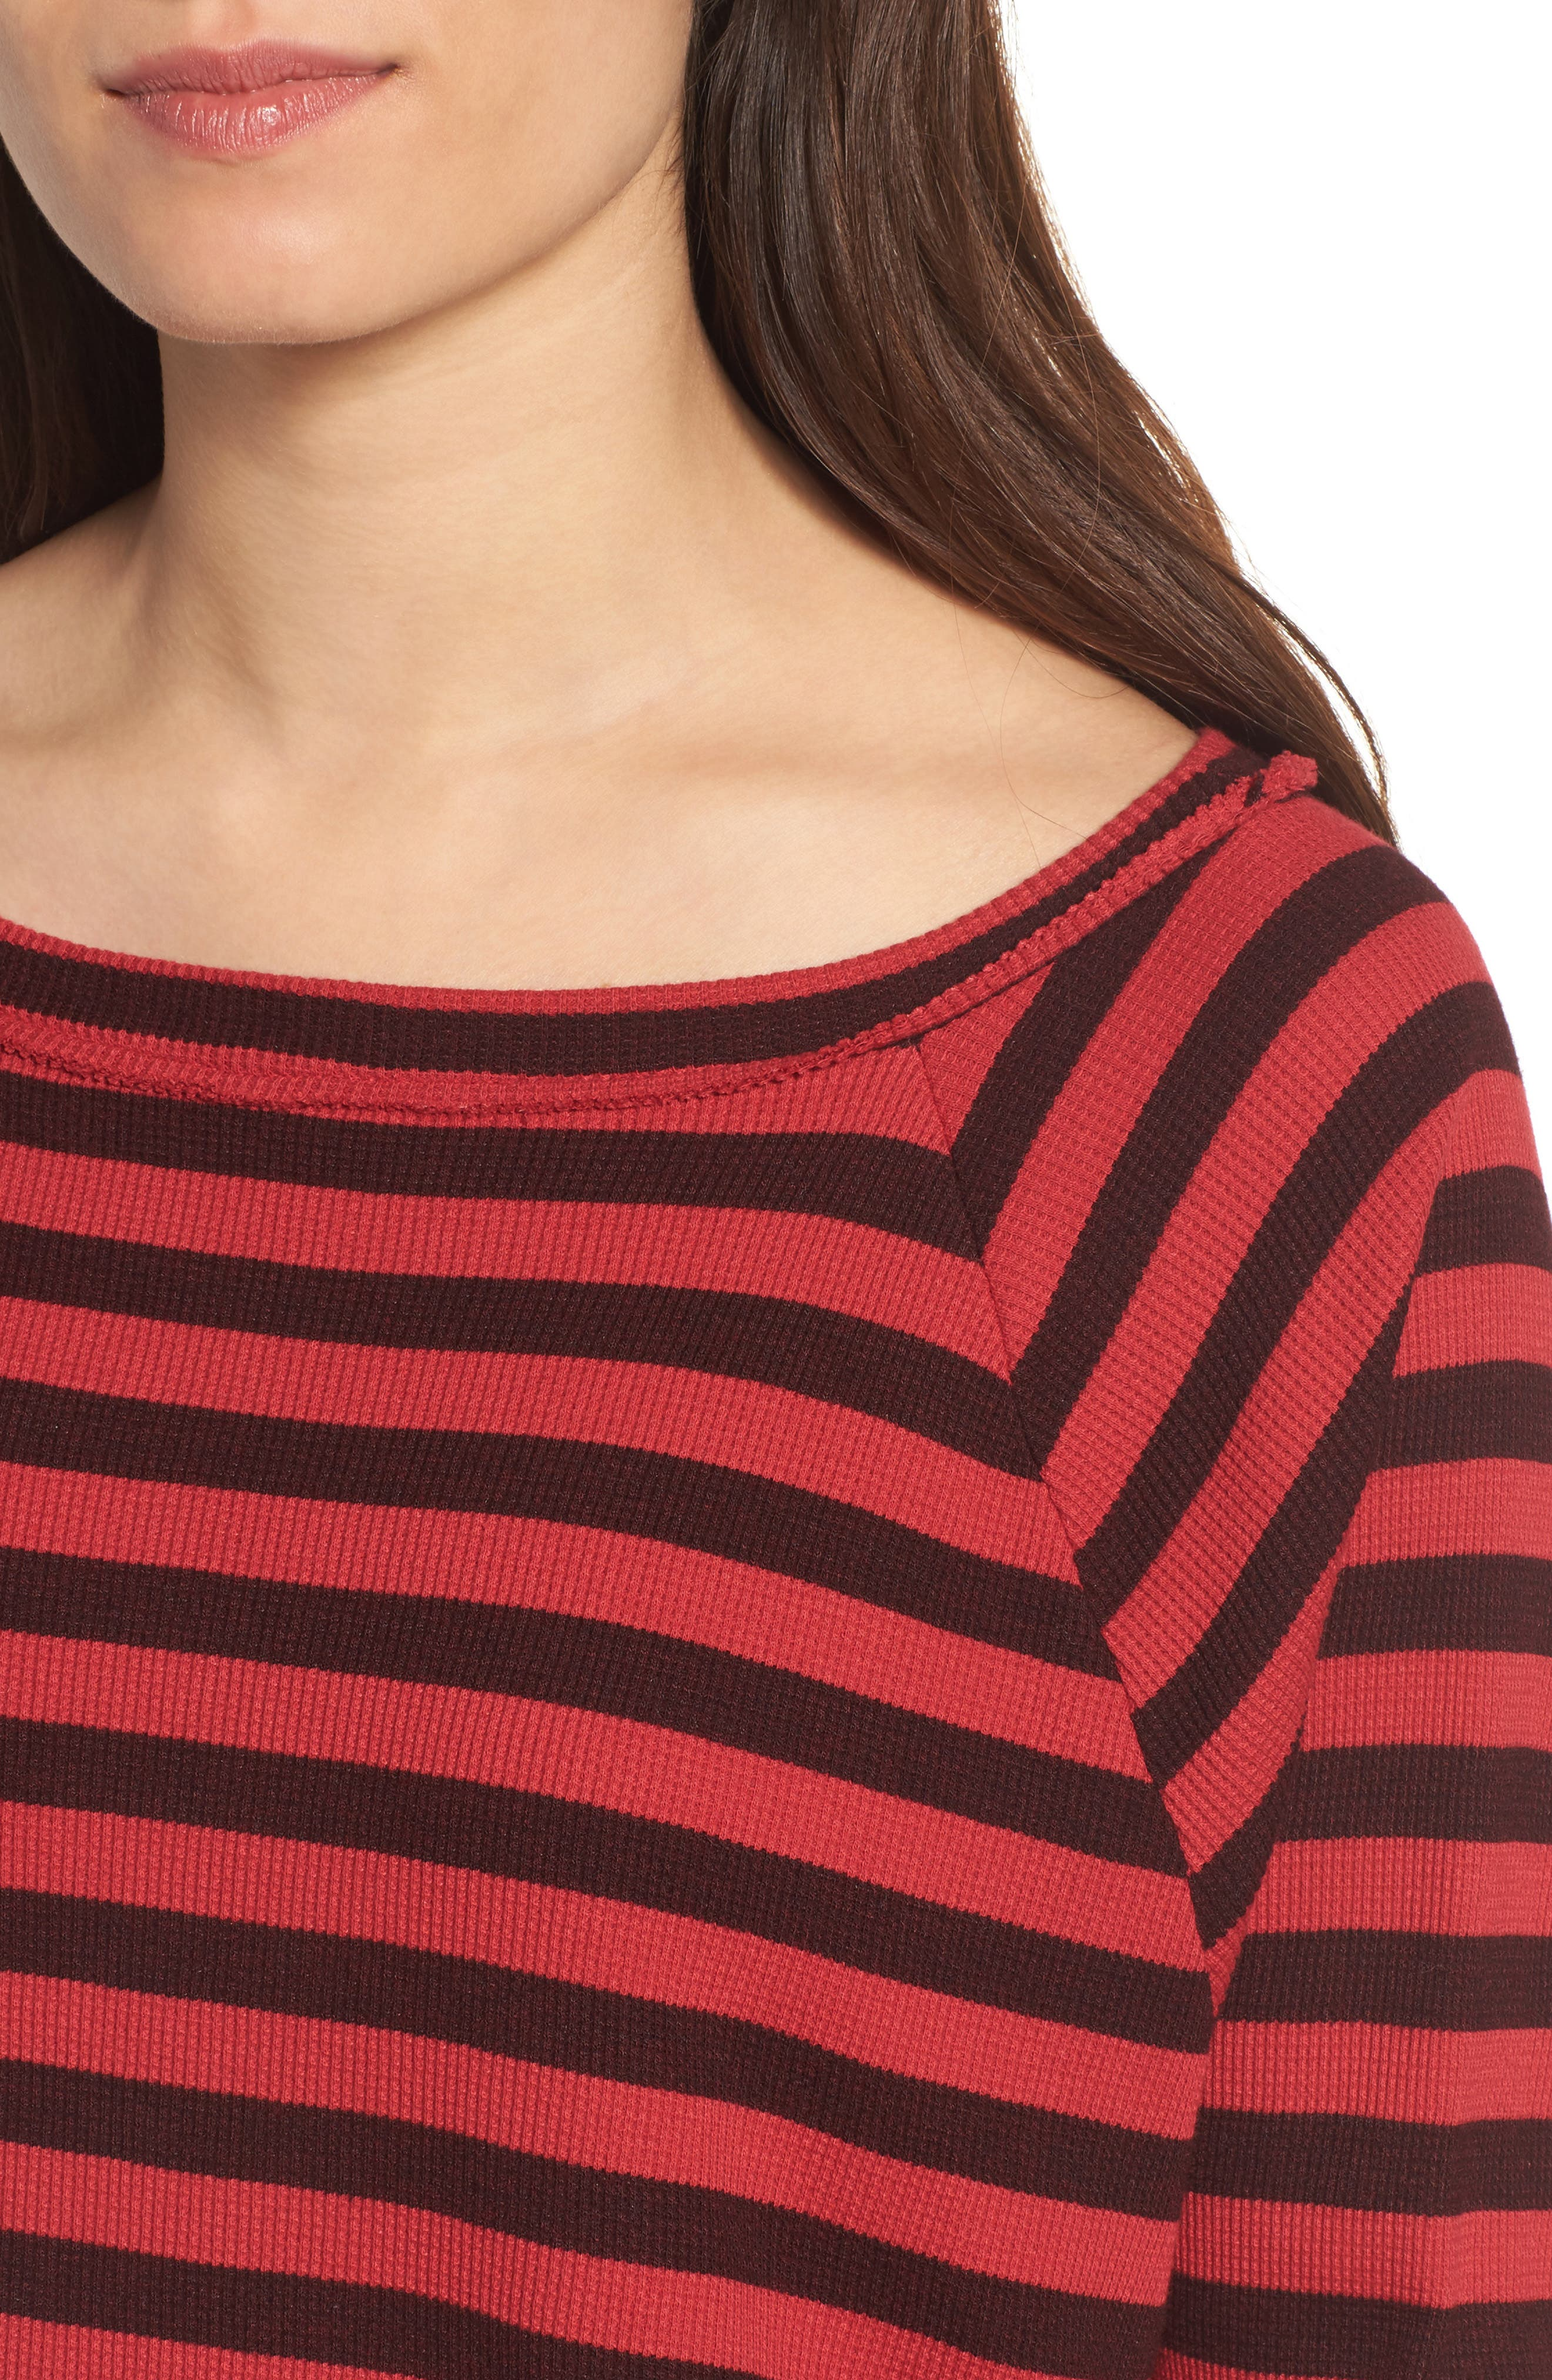 Stripe Thermal Top,                             Alternate thumbnail 4, color,                             Scarlet